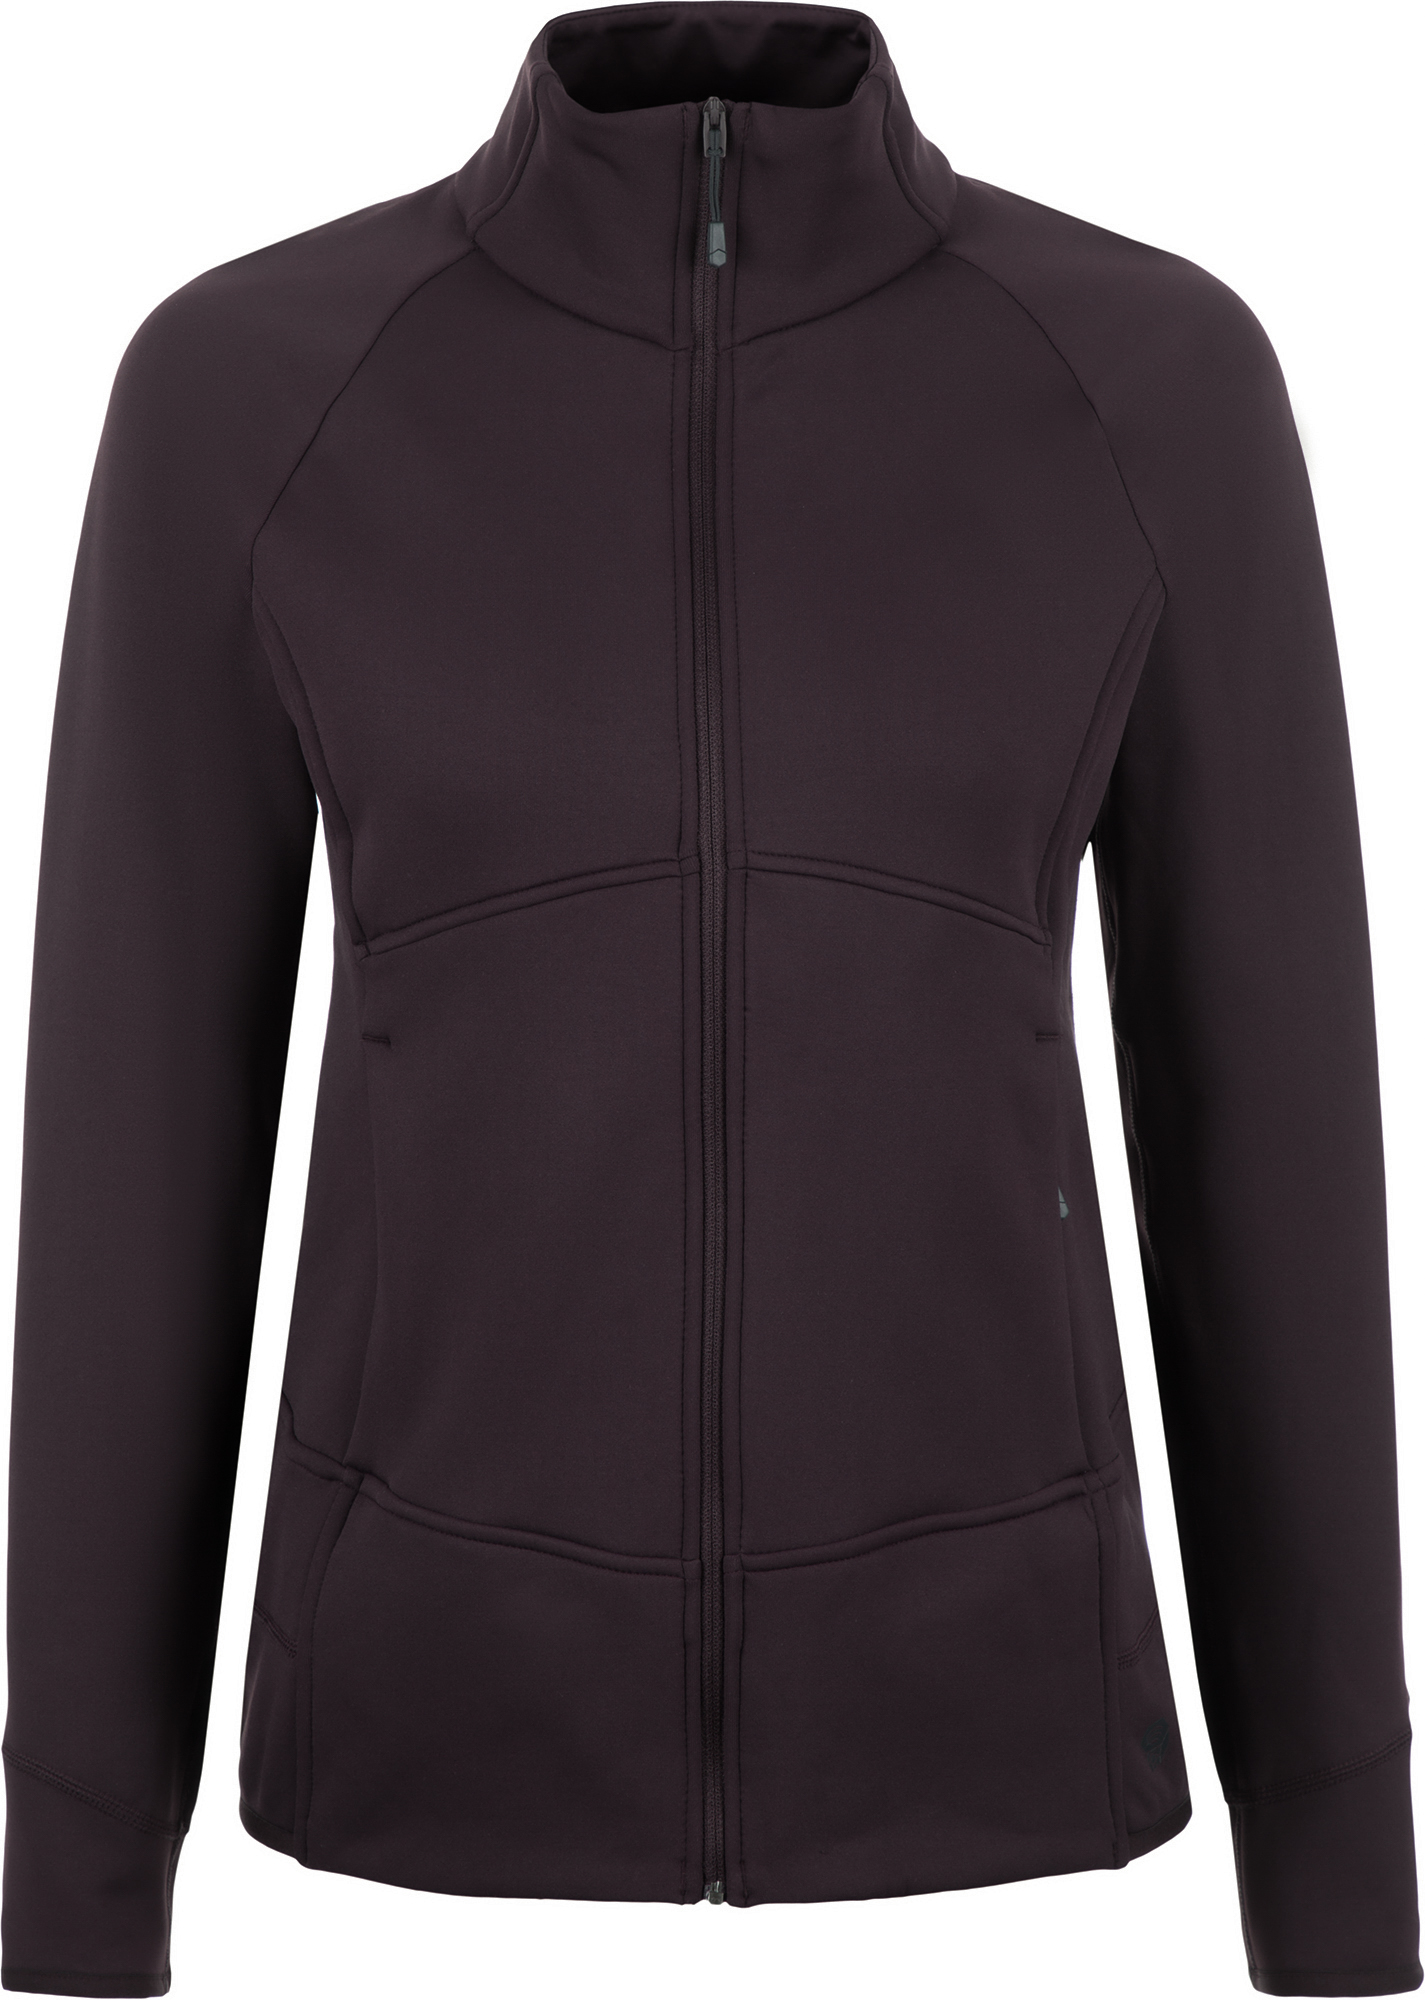 Mountain Hardwear Джемпер флисовый женский Mountain Hardwear Frostzone™, размер 44 цена в Москве и Питере